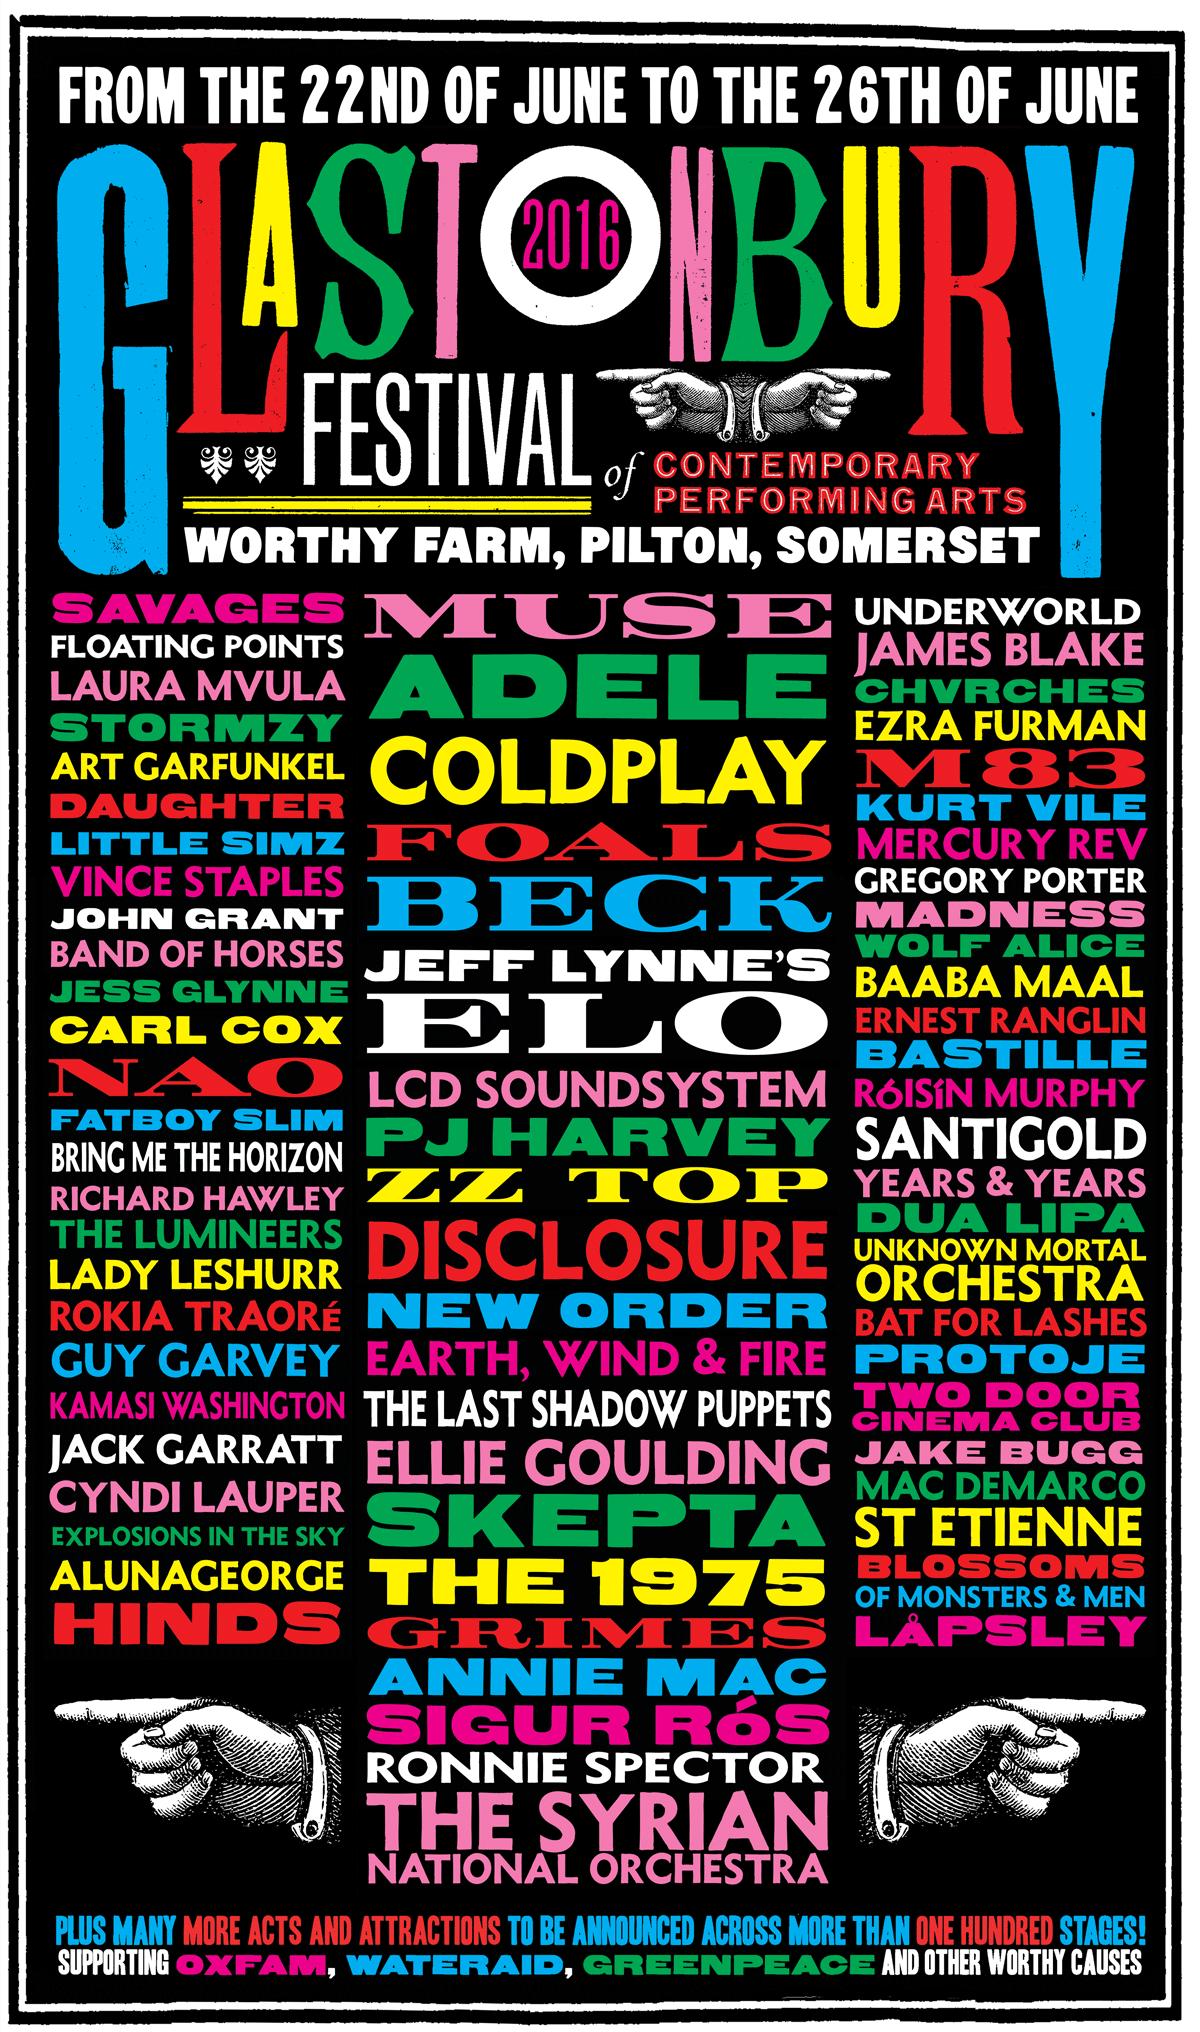 glastonbury 2016 lineup phase 1 (2)